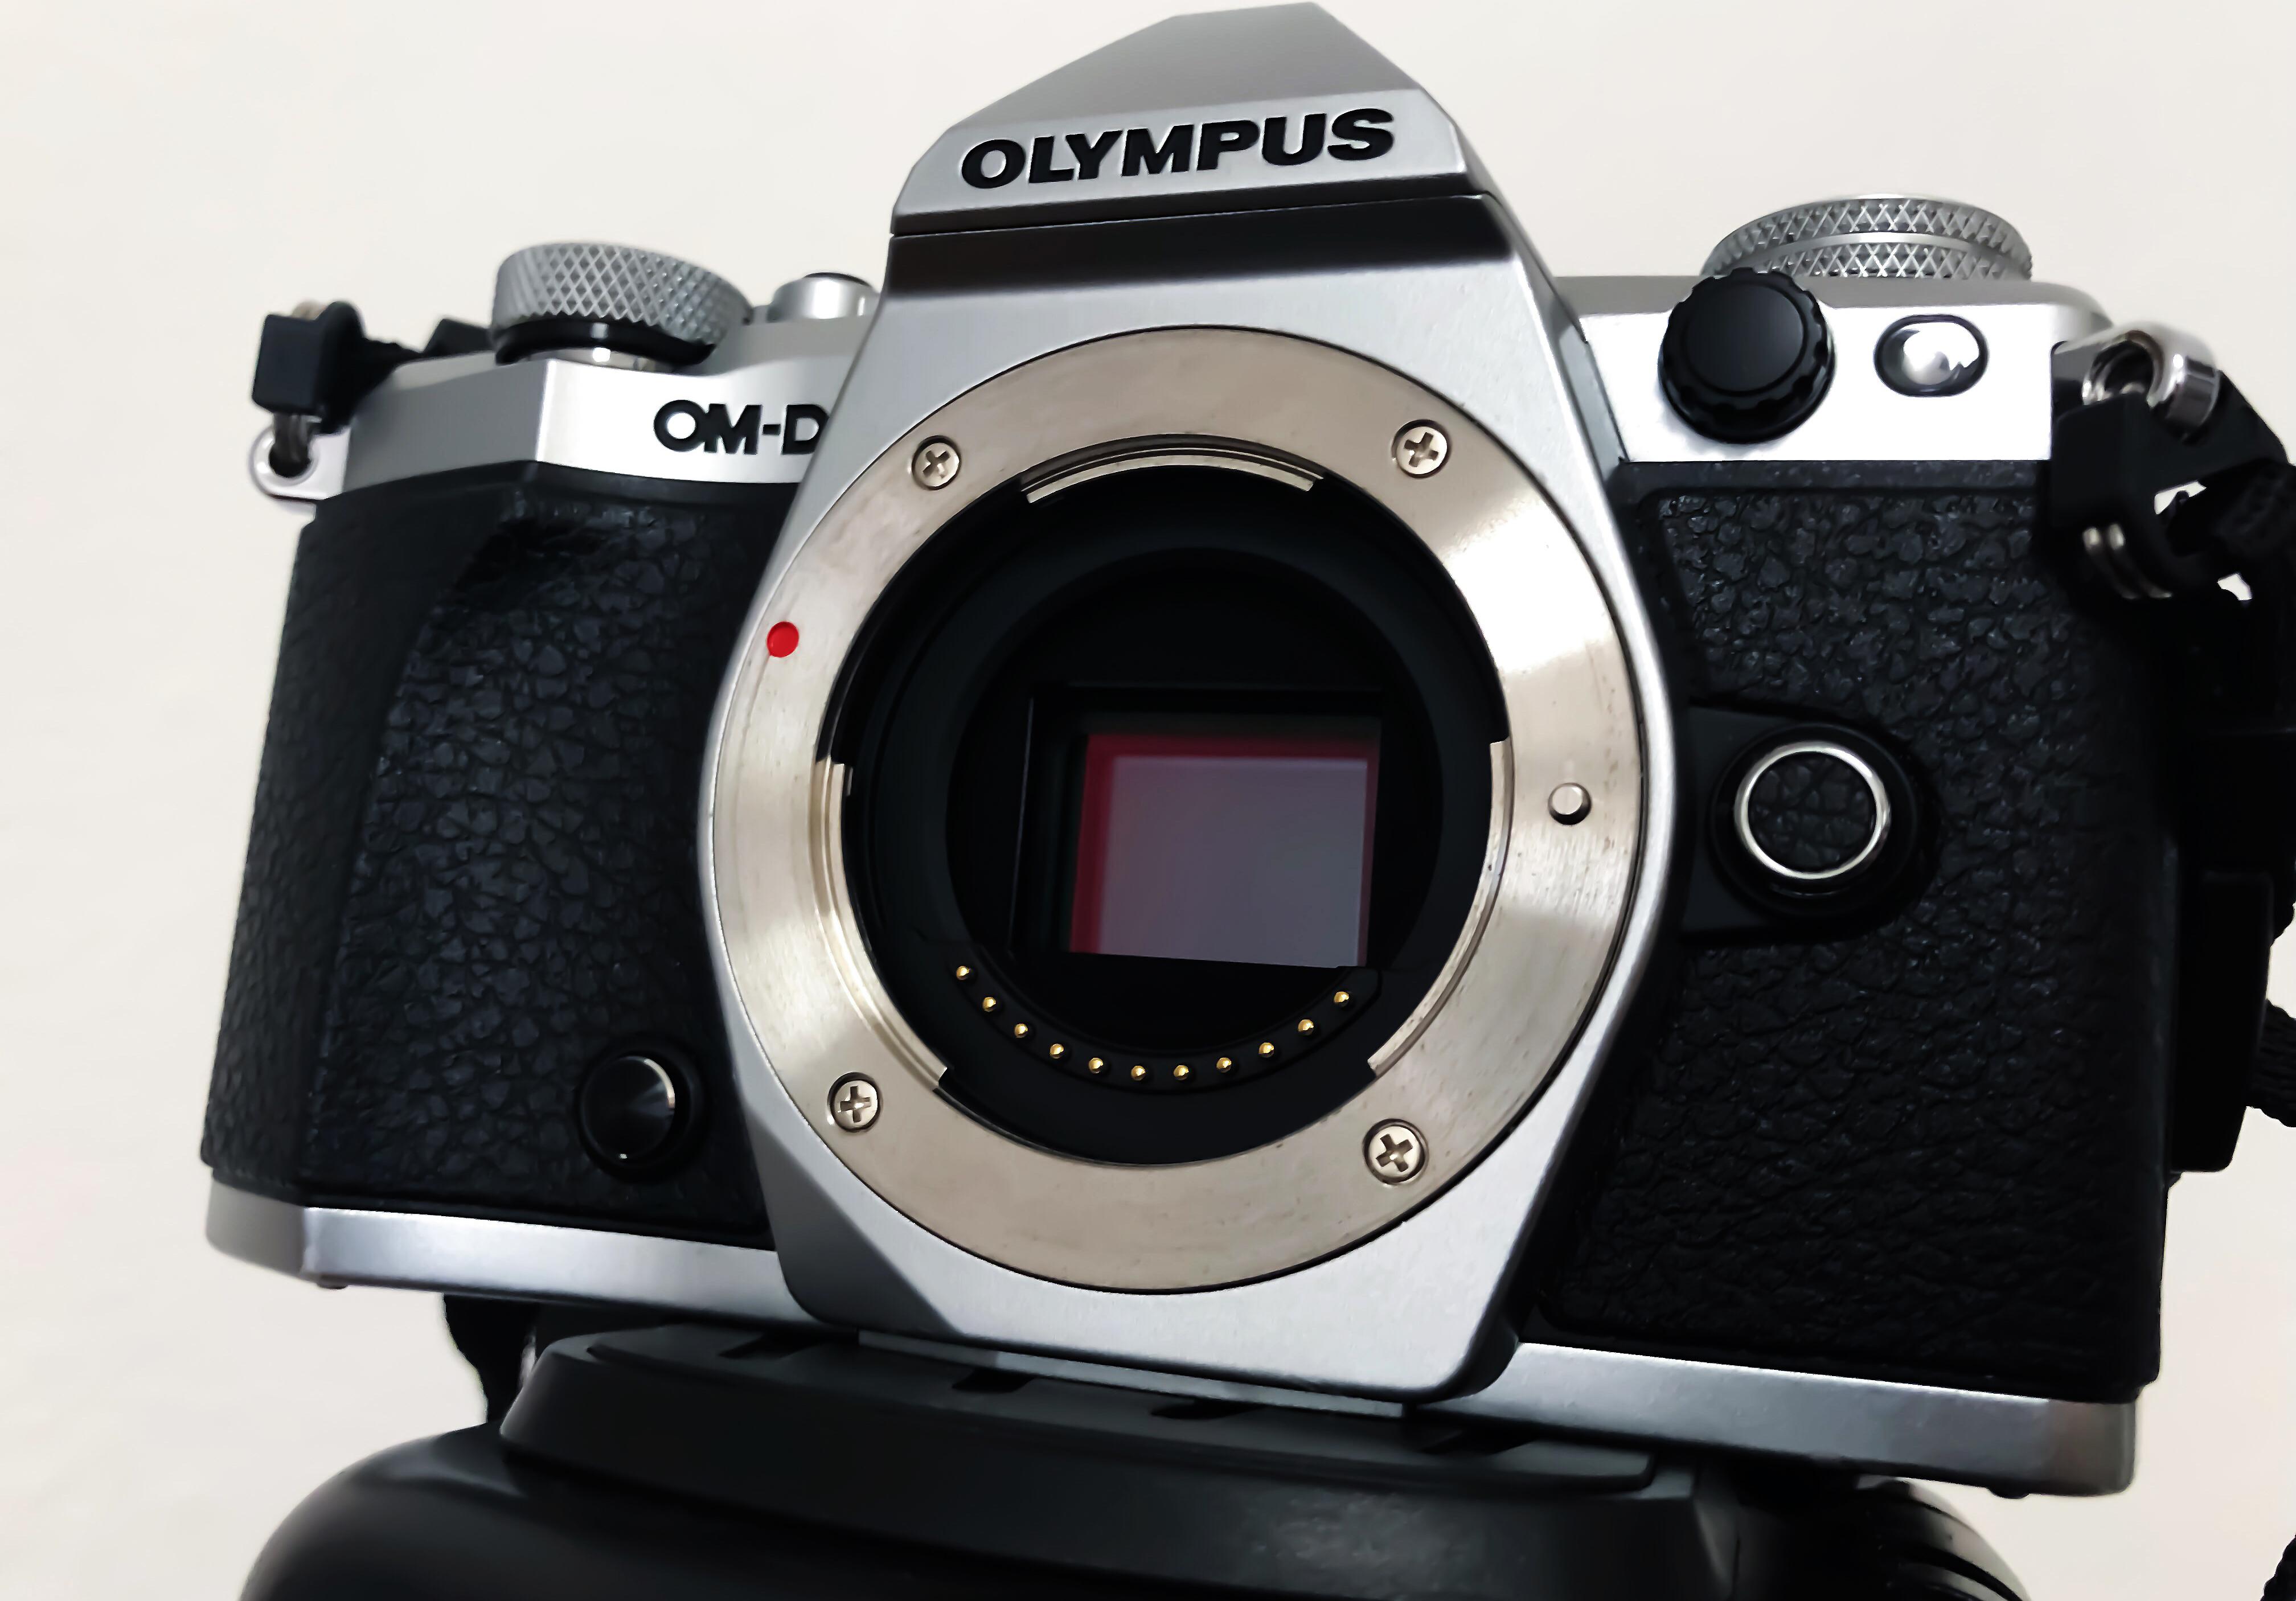 Why a MFT camera? - moabiterpflanze